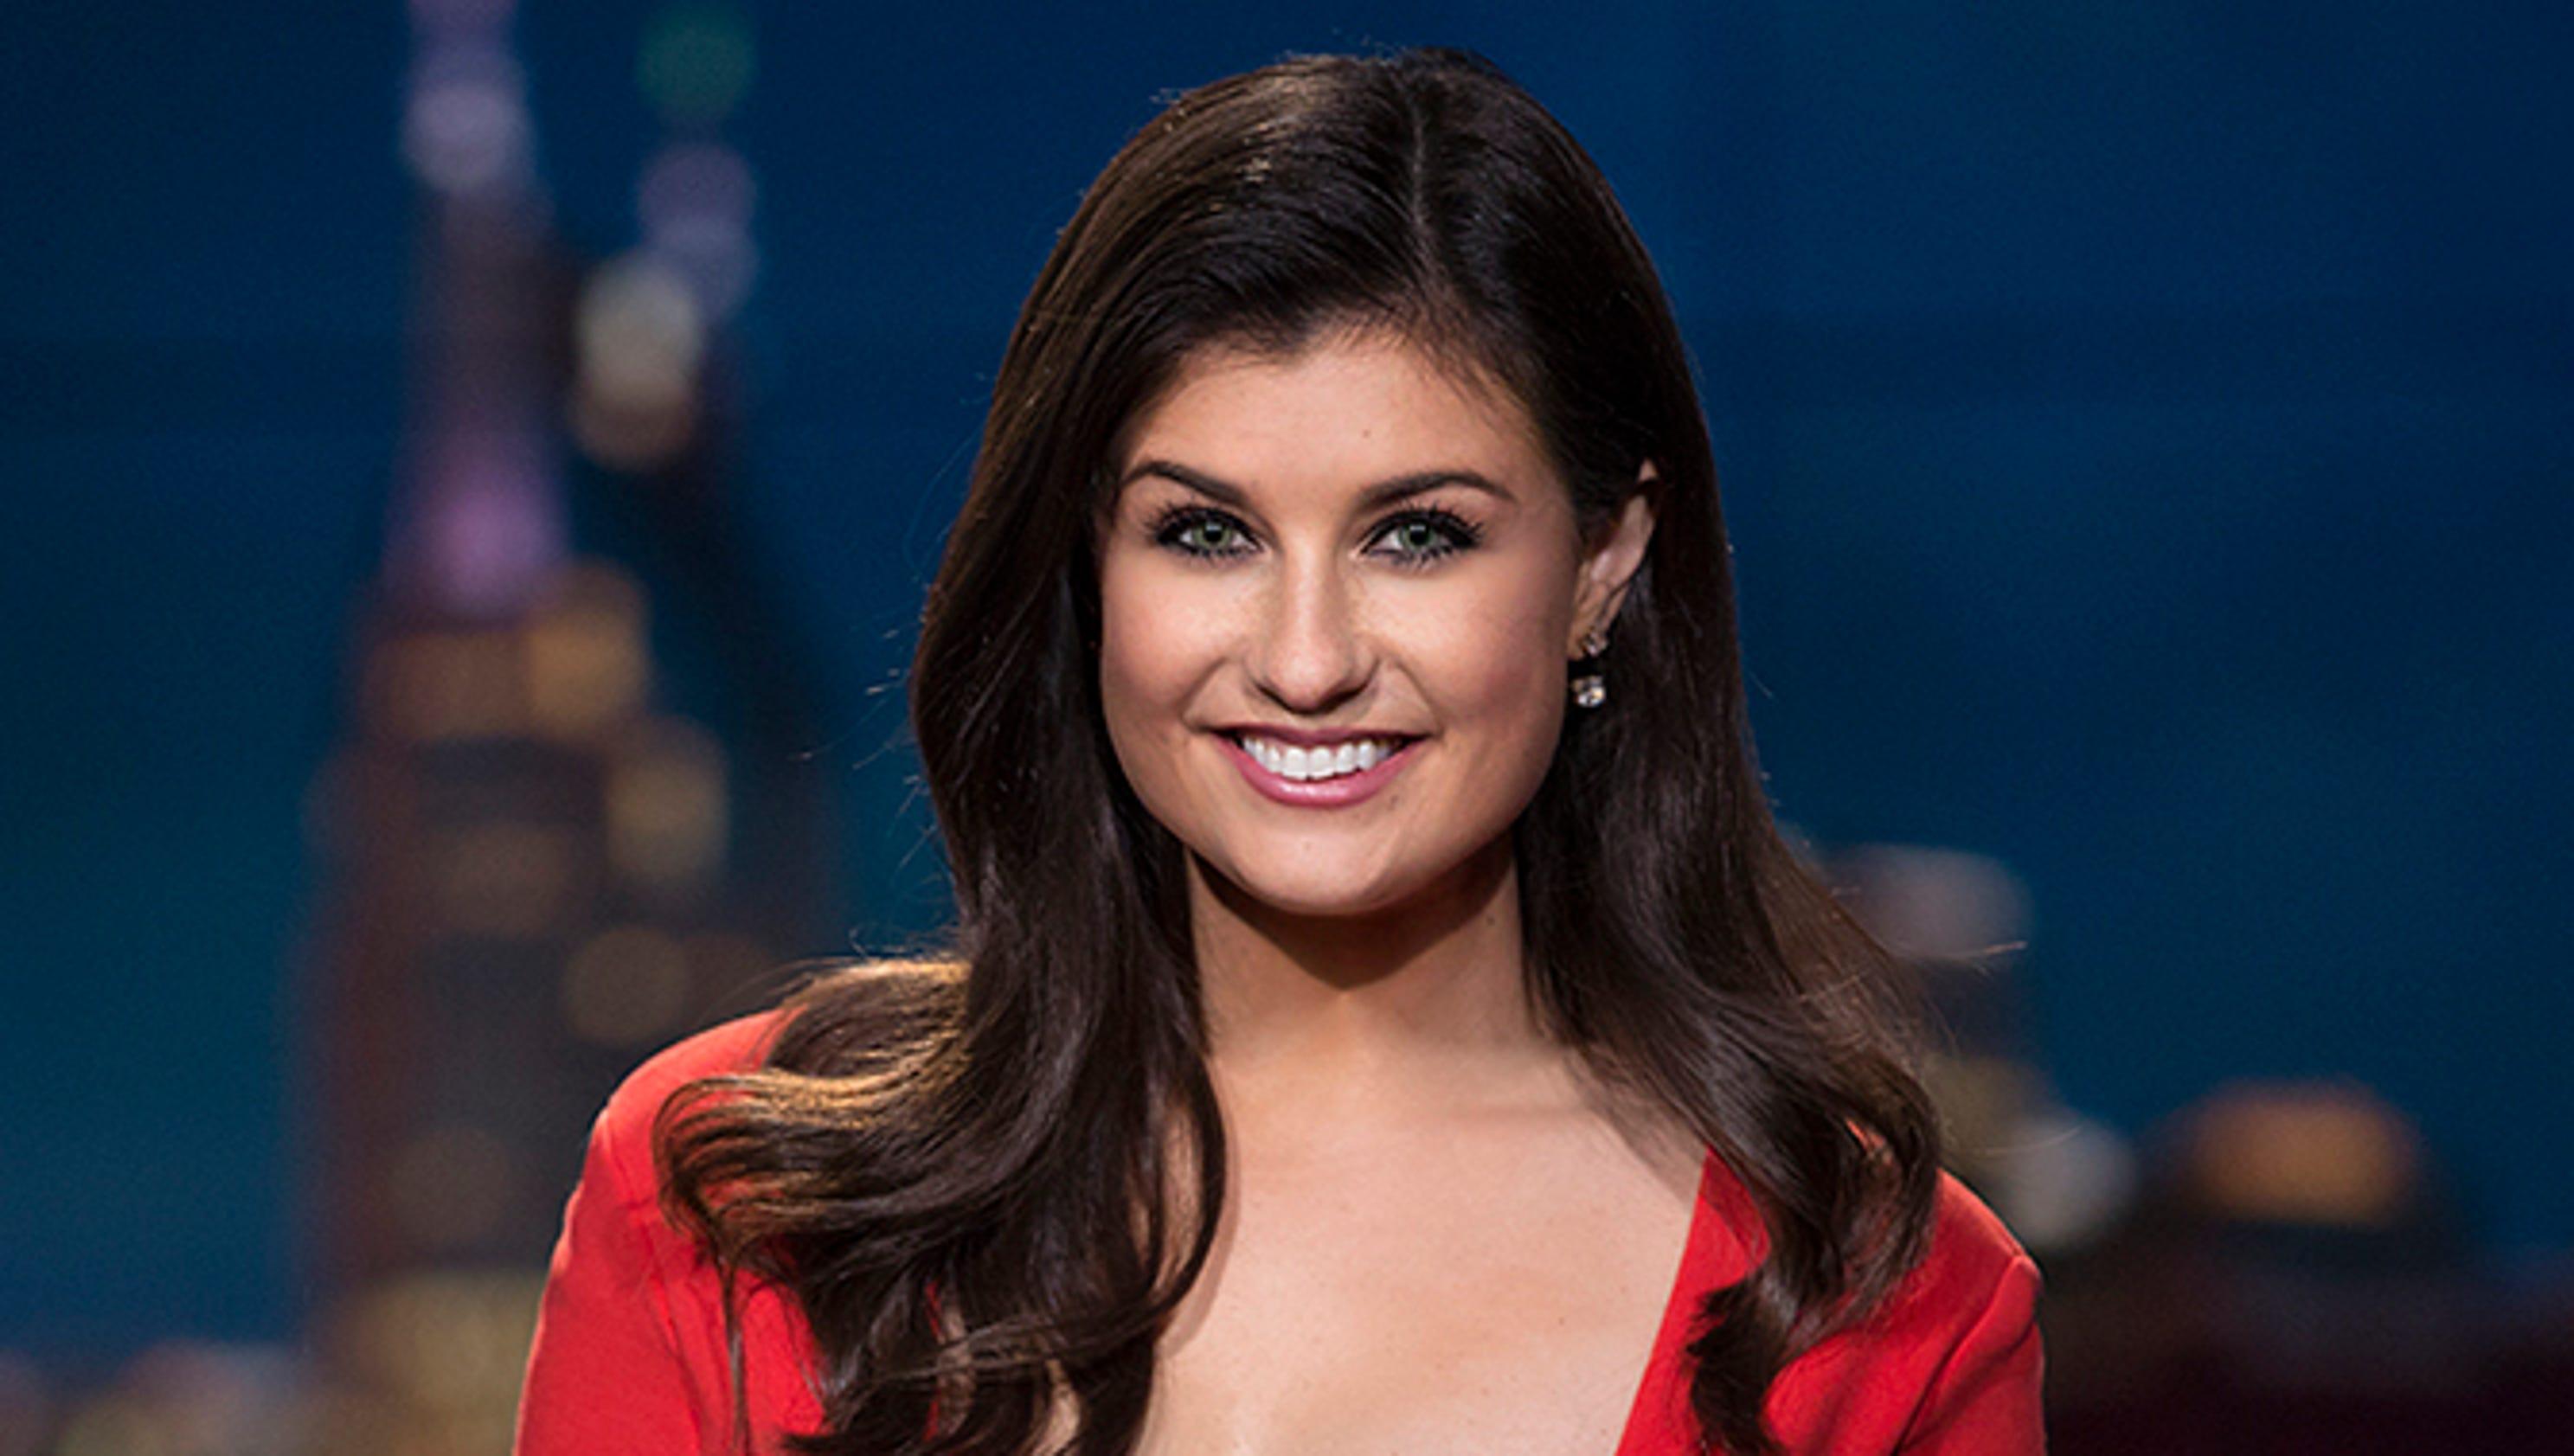 news 2 replaces dawn davenport with weekend anchor nikki burdine